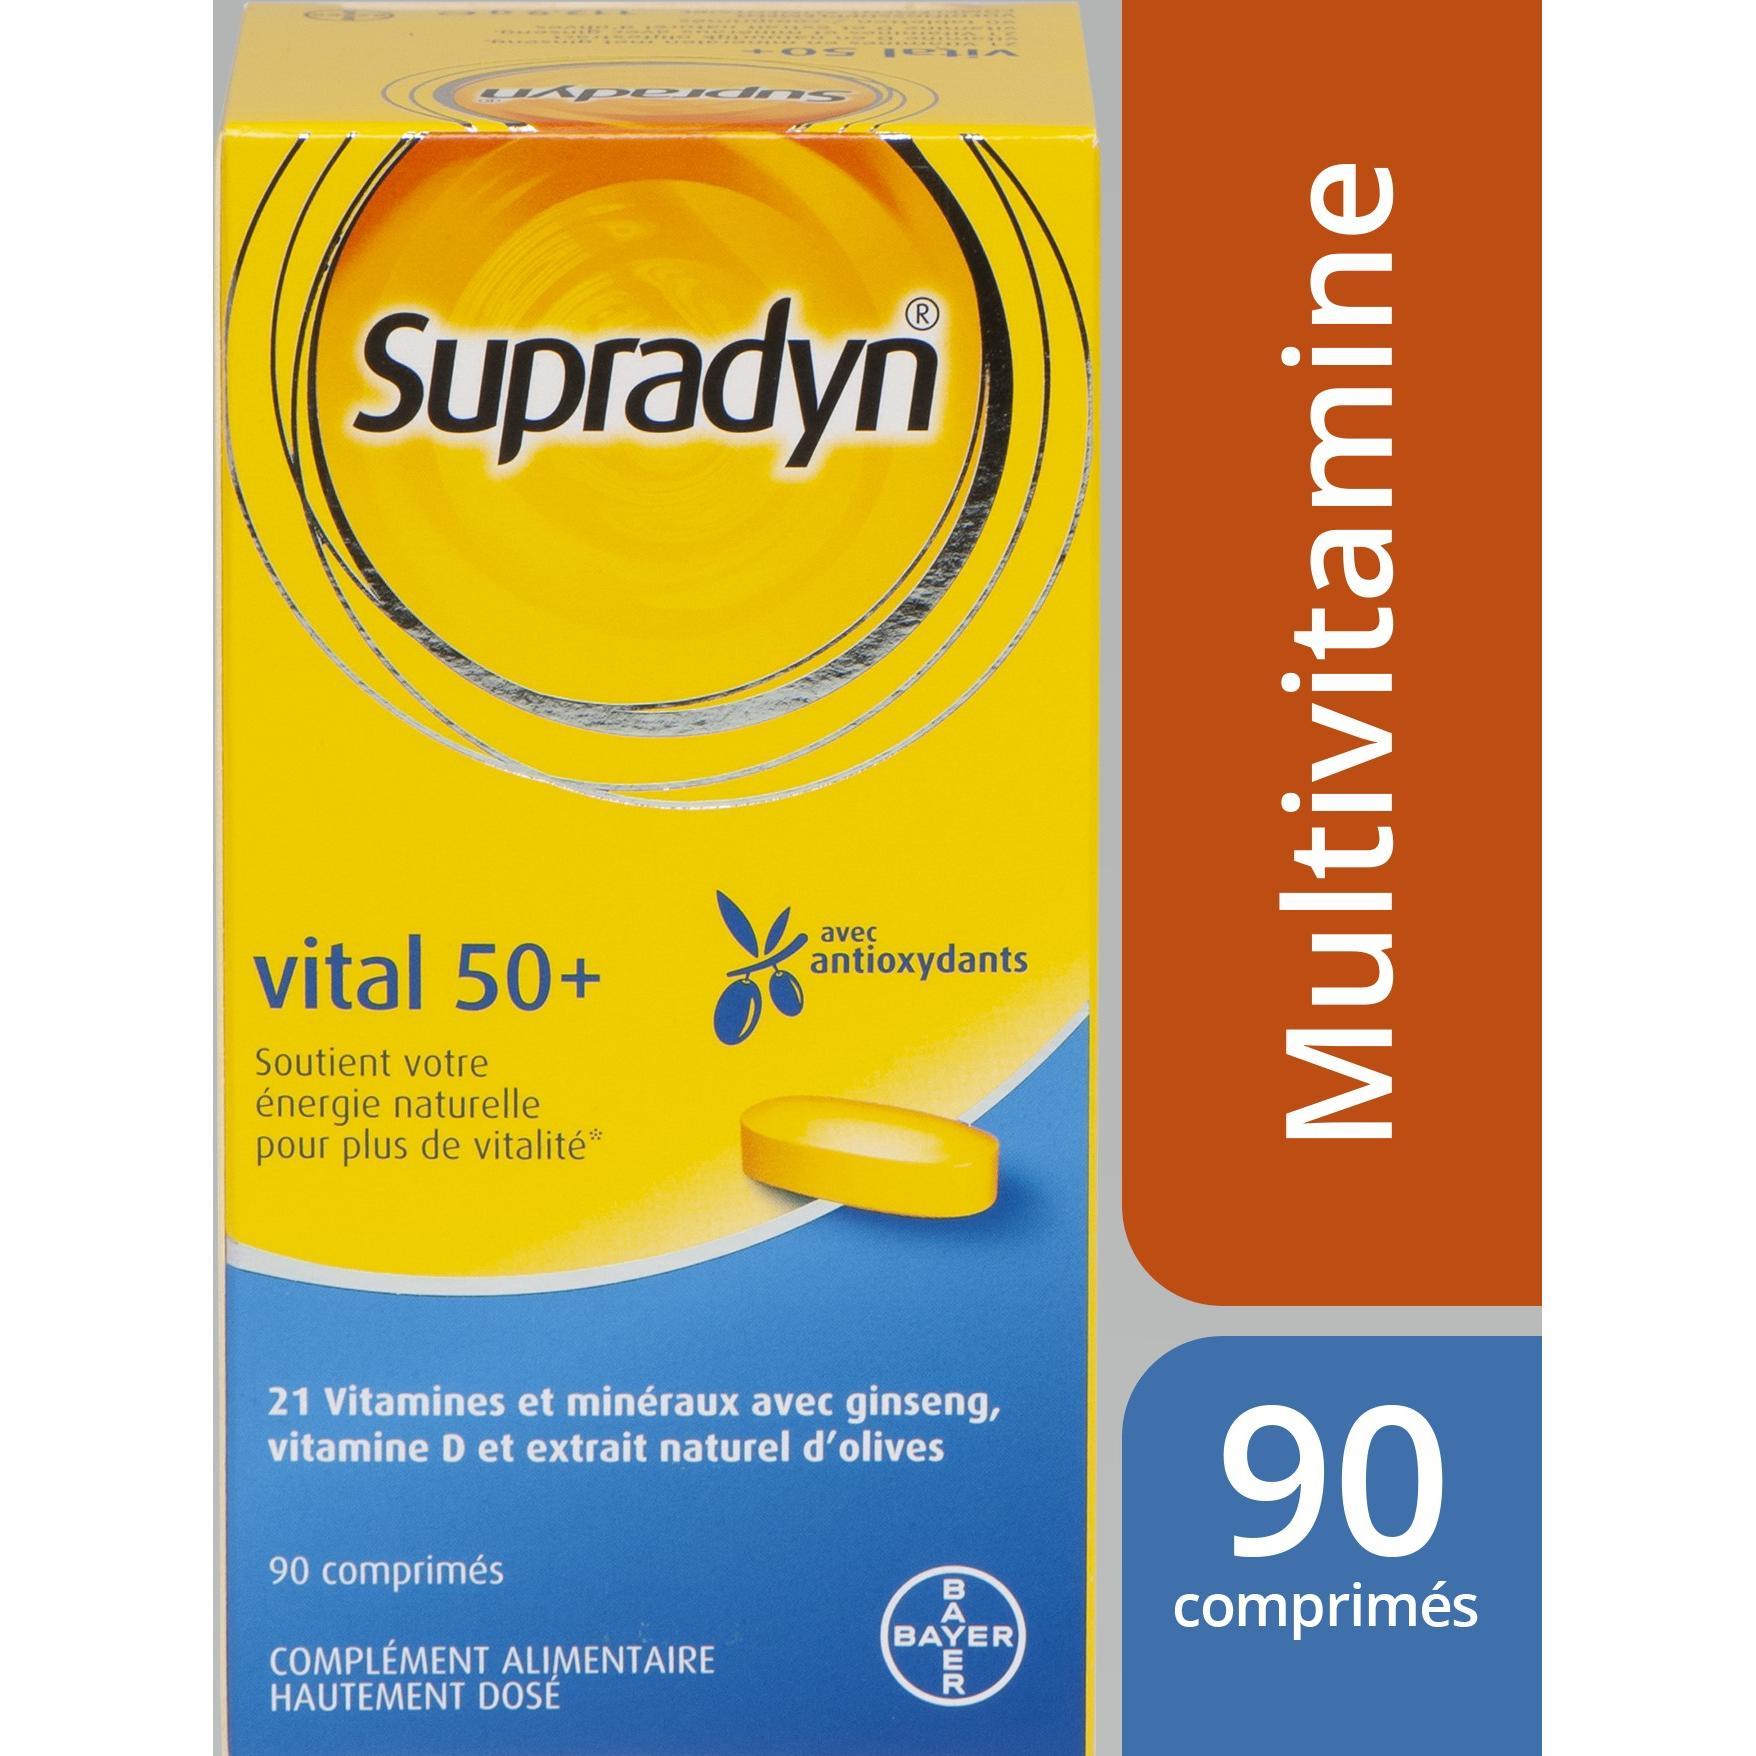 Image of Supradyn vital 50+